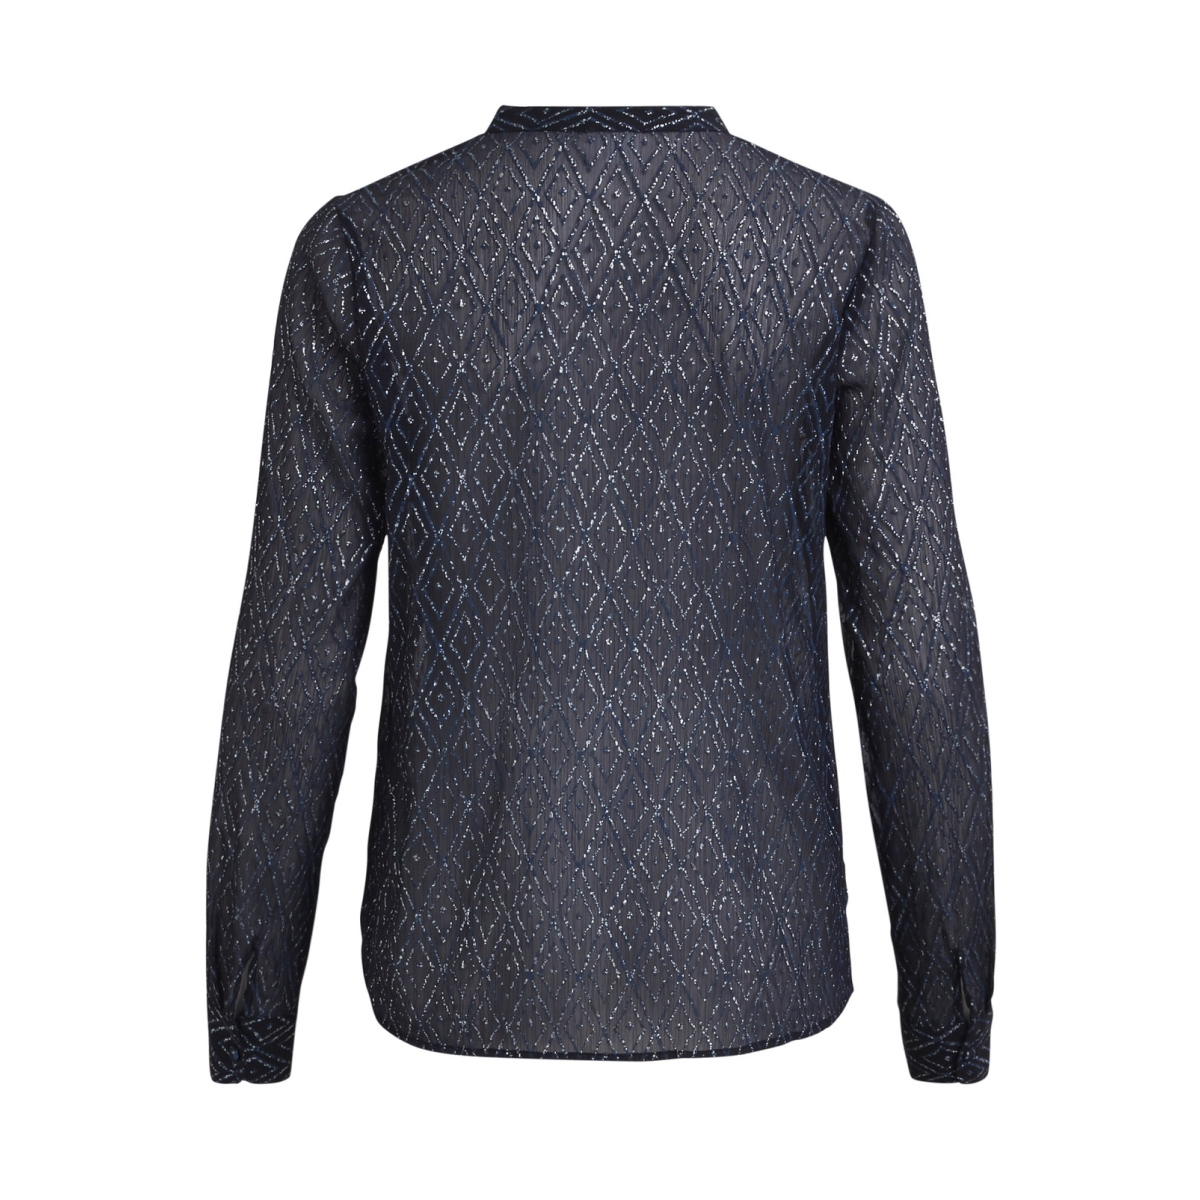 vibello l/s shirt/p 14043654 vila blouse dark navy/vibello pr